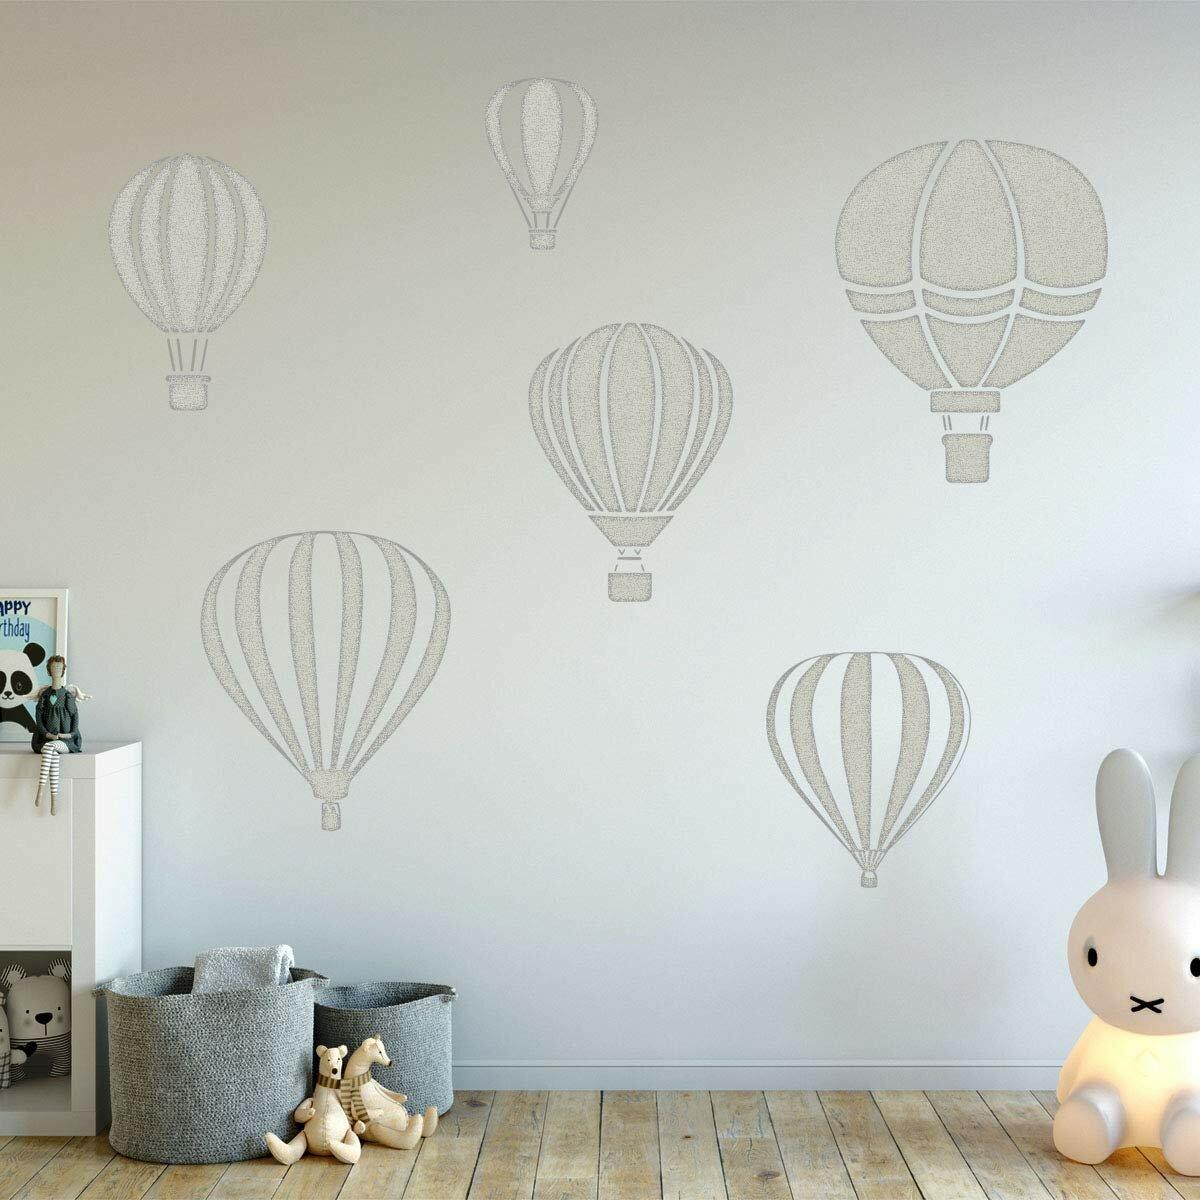 Hot Air Balloon Wall Decal Kid Transport Wall Decal Wall Decals Nursery Balloon Kids Wall Decal REUSABLE Nursery Wall Decal Airplane